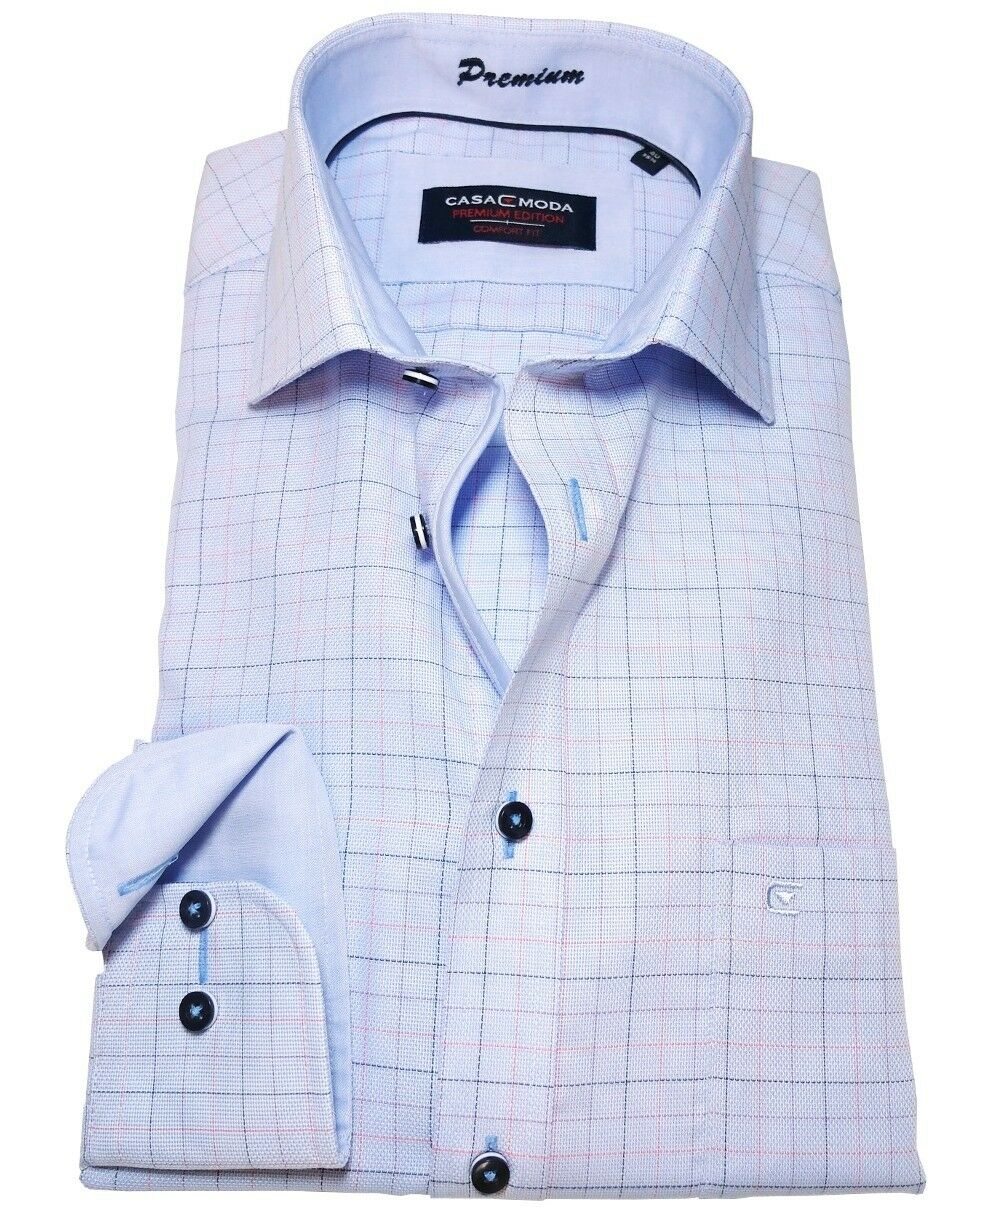 Casa Moda Comfort Fit Premium Langarmhemd Übergrösse Karo bügelfrei Gr. 40 - 56